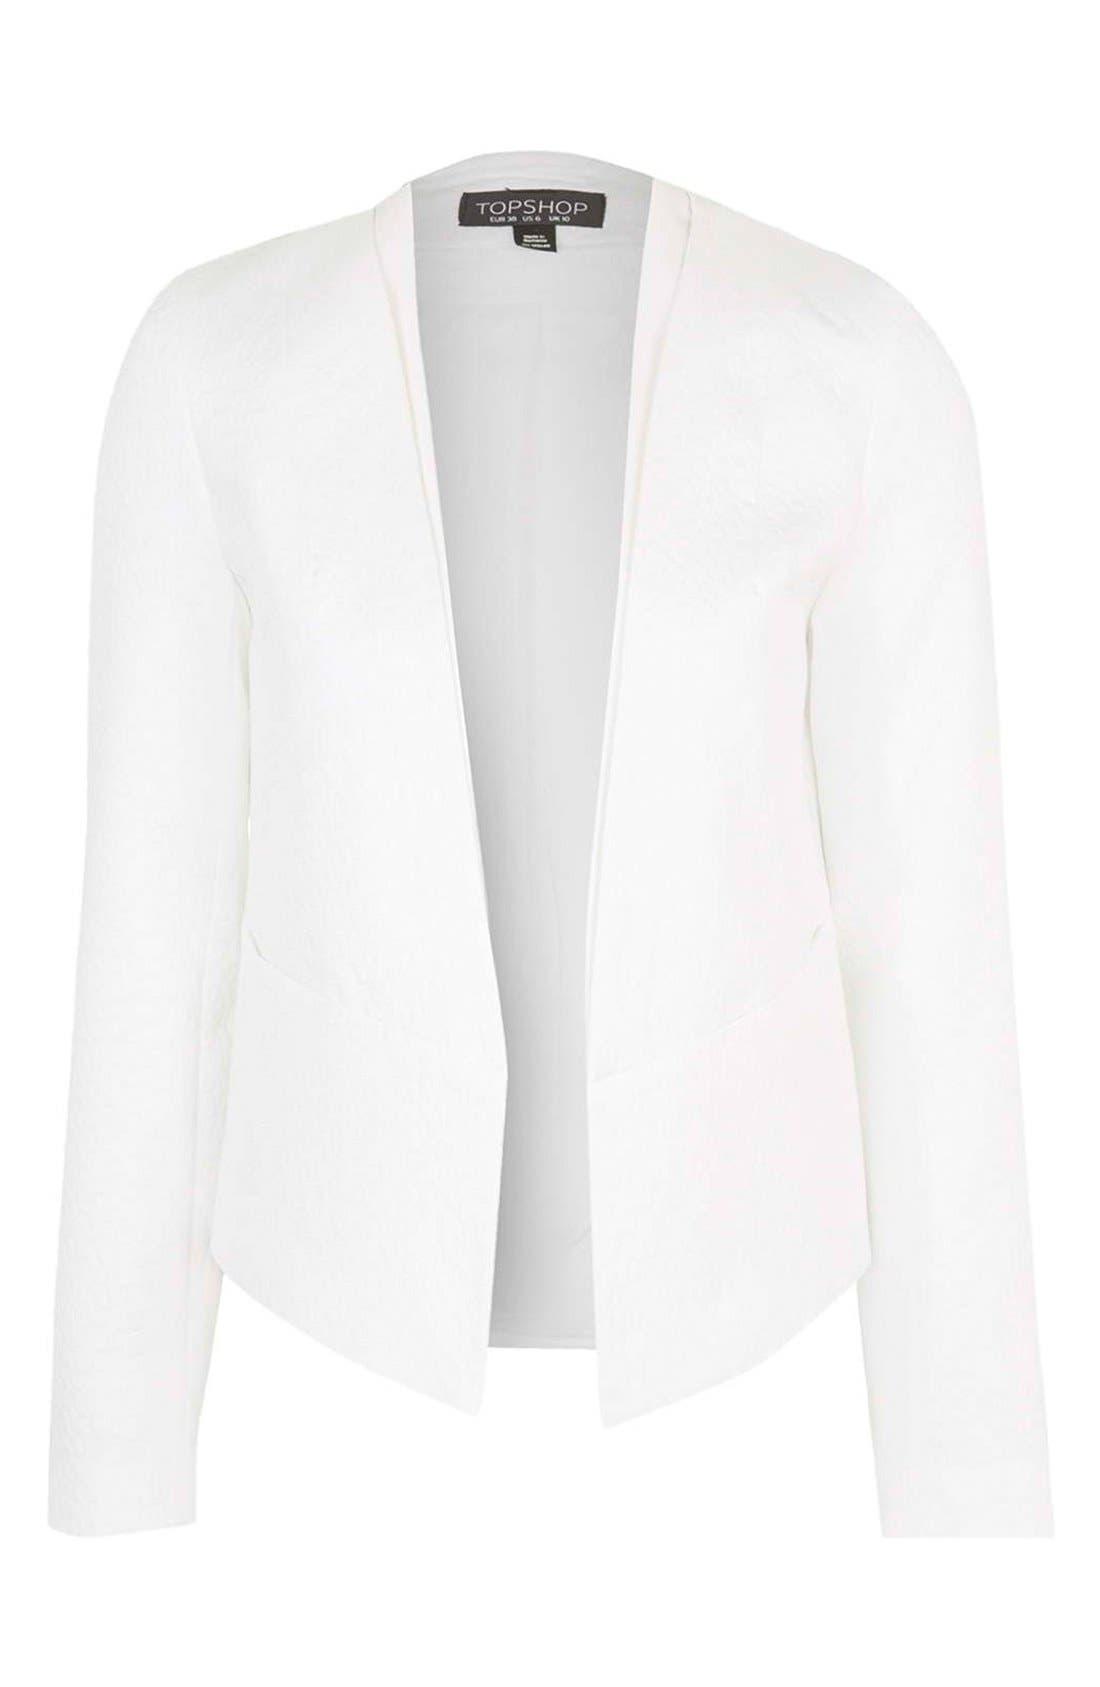 Alternate Image 3  - Topshop 'Poppy' Textured Double Collar Blazer